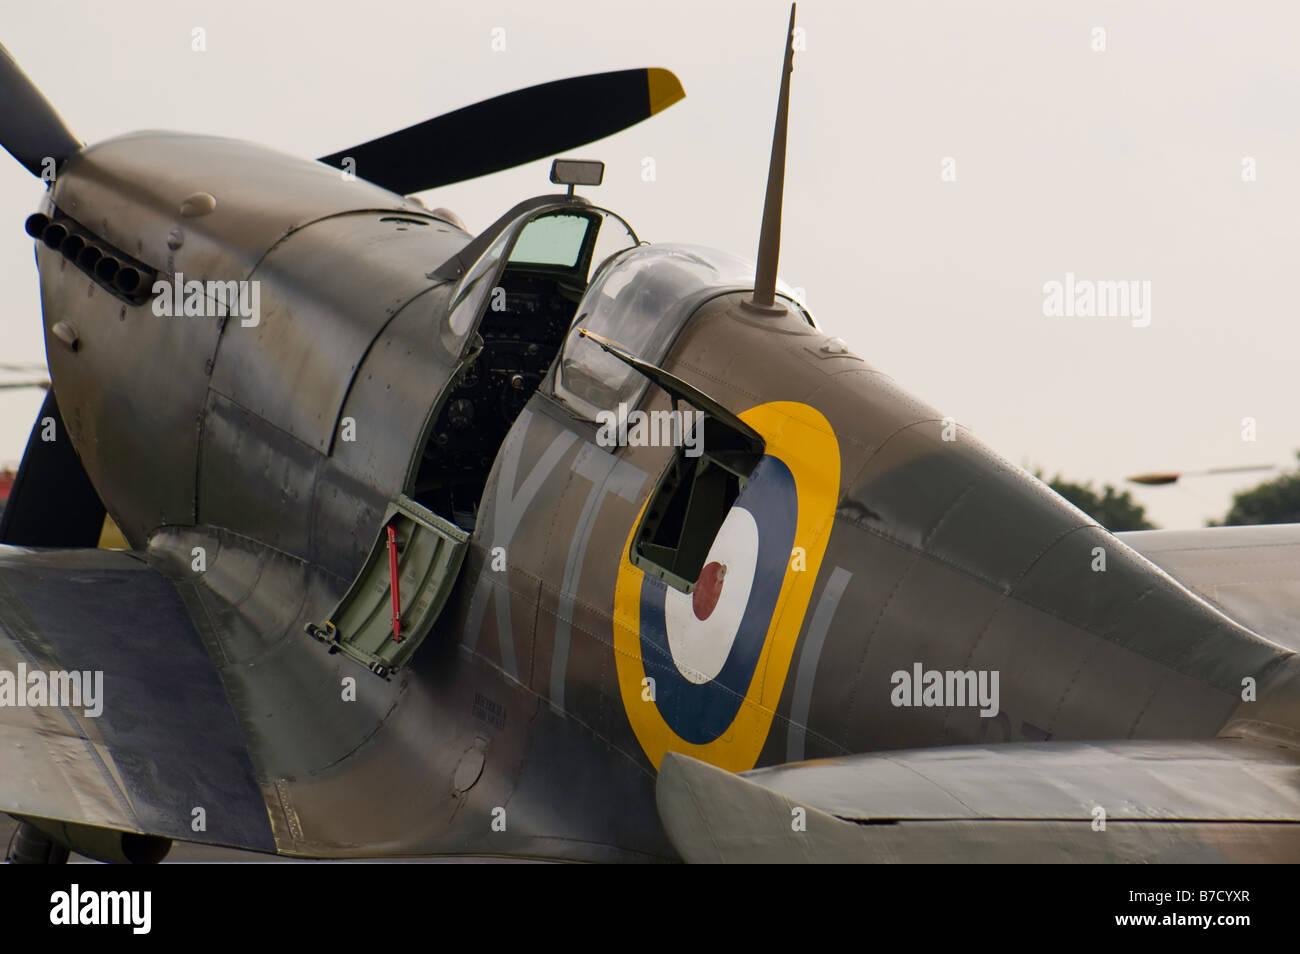 British World War Two fighter aircraft Hawker Hurricane at Biggin hill Air Fair June 2008 - Stock Image